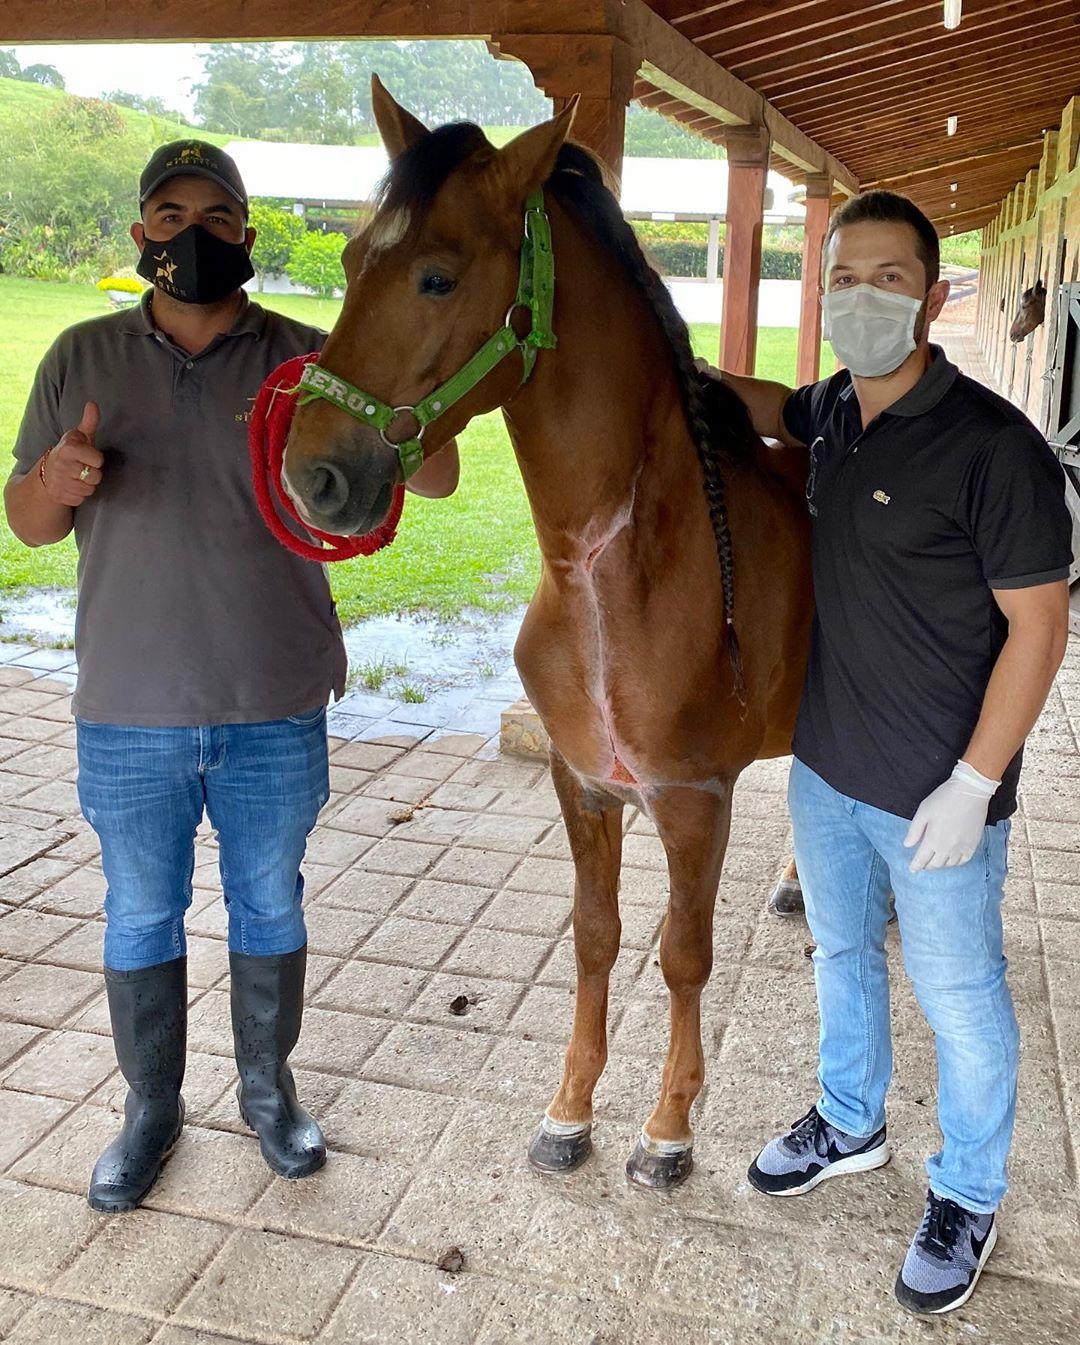 processo de necrose - cavalo recuperado